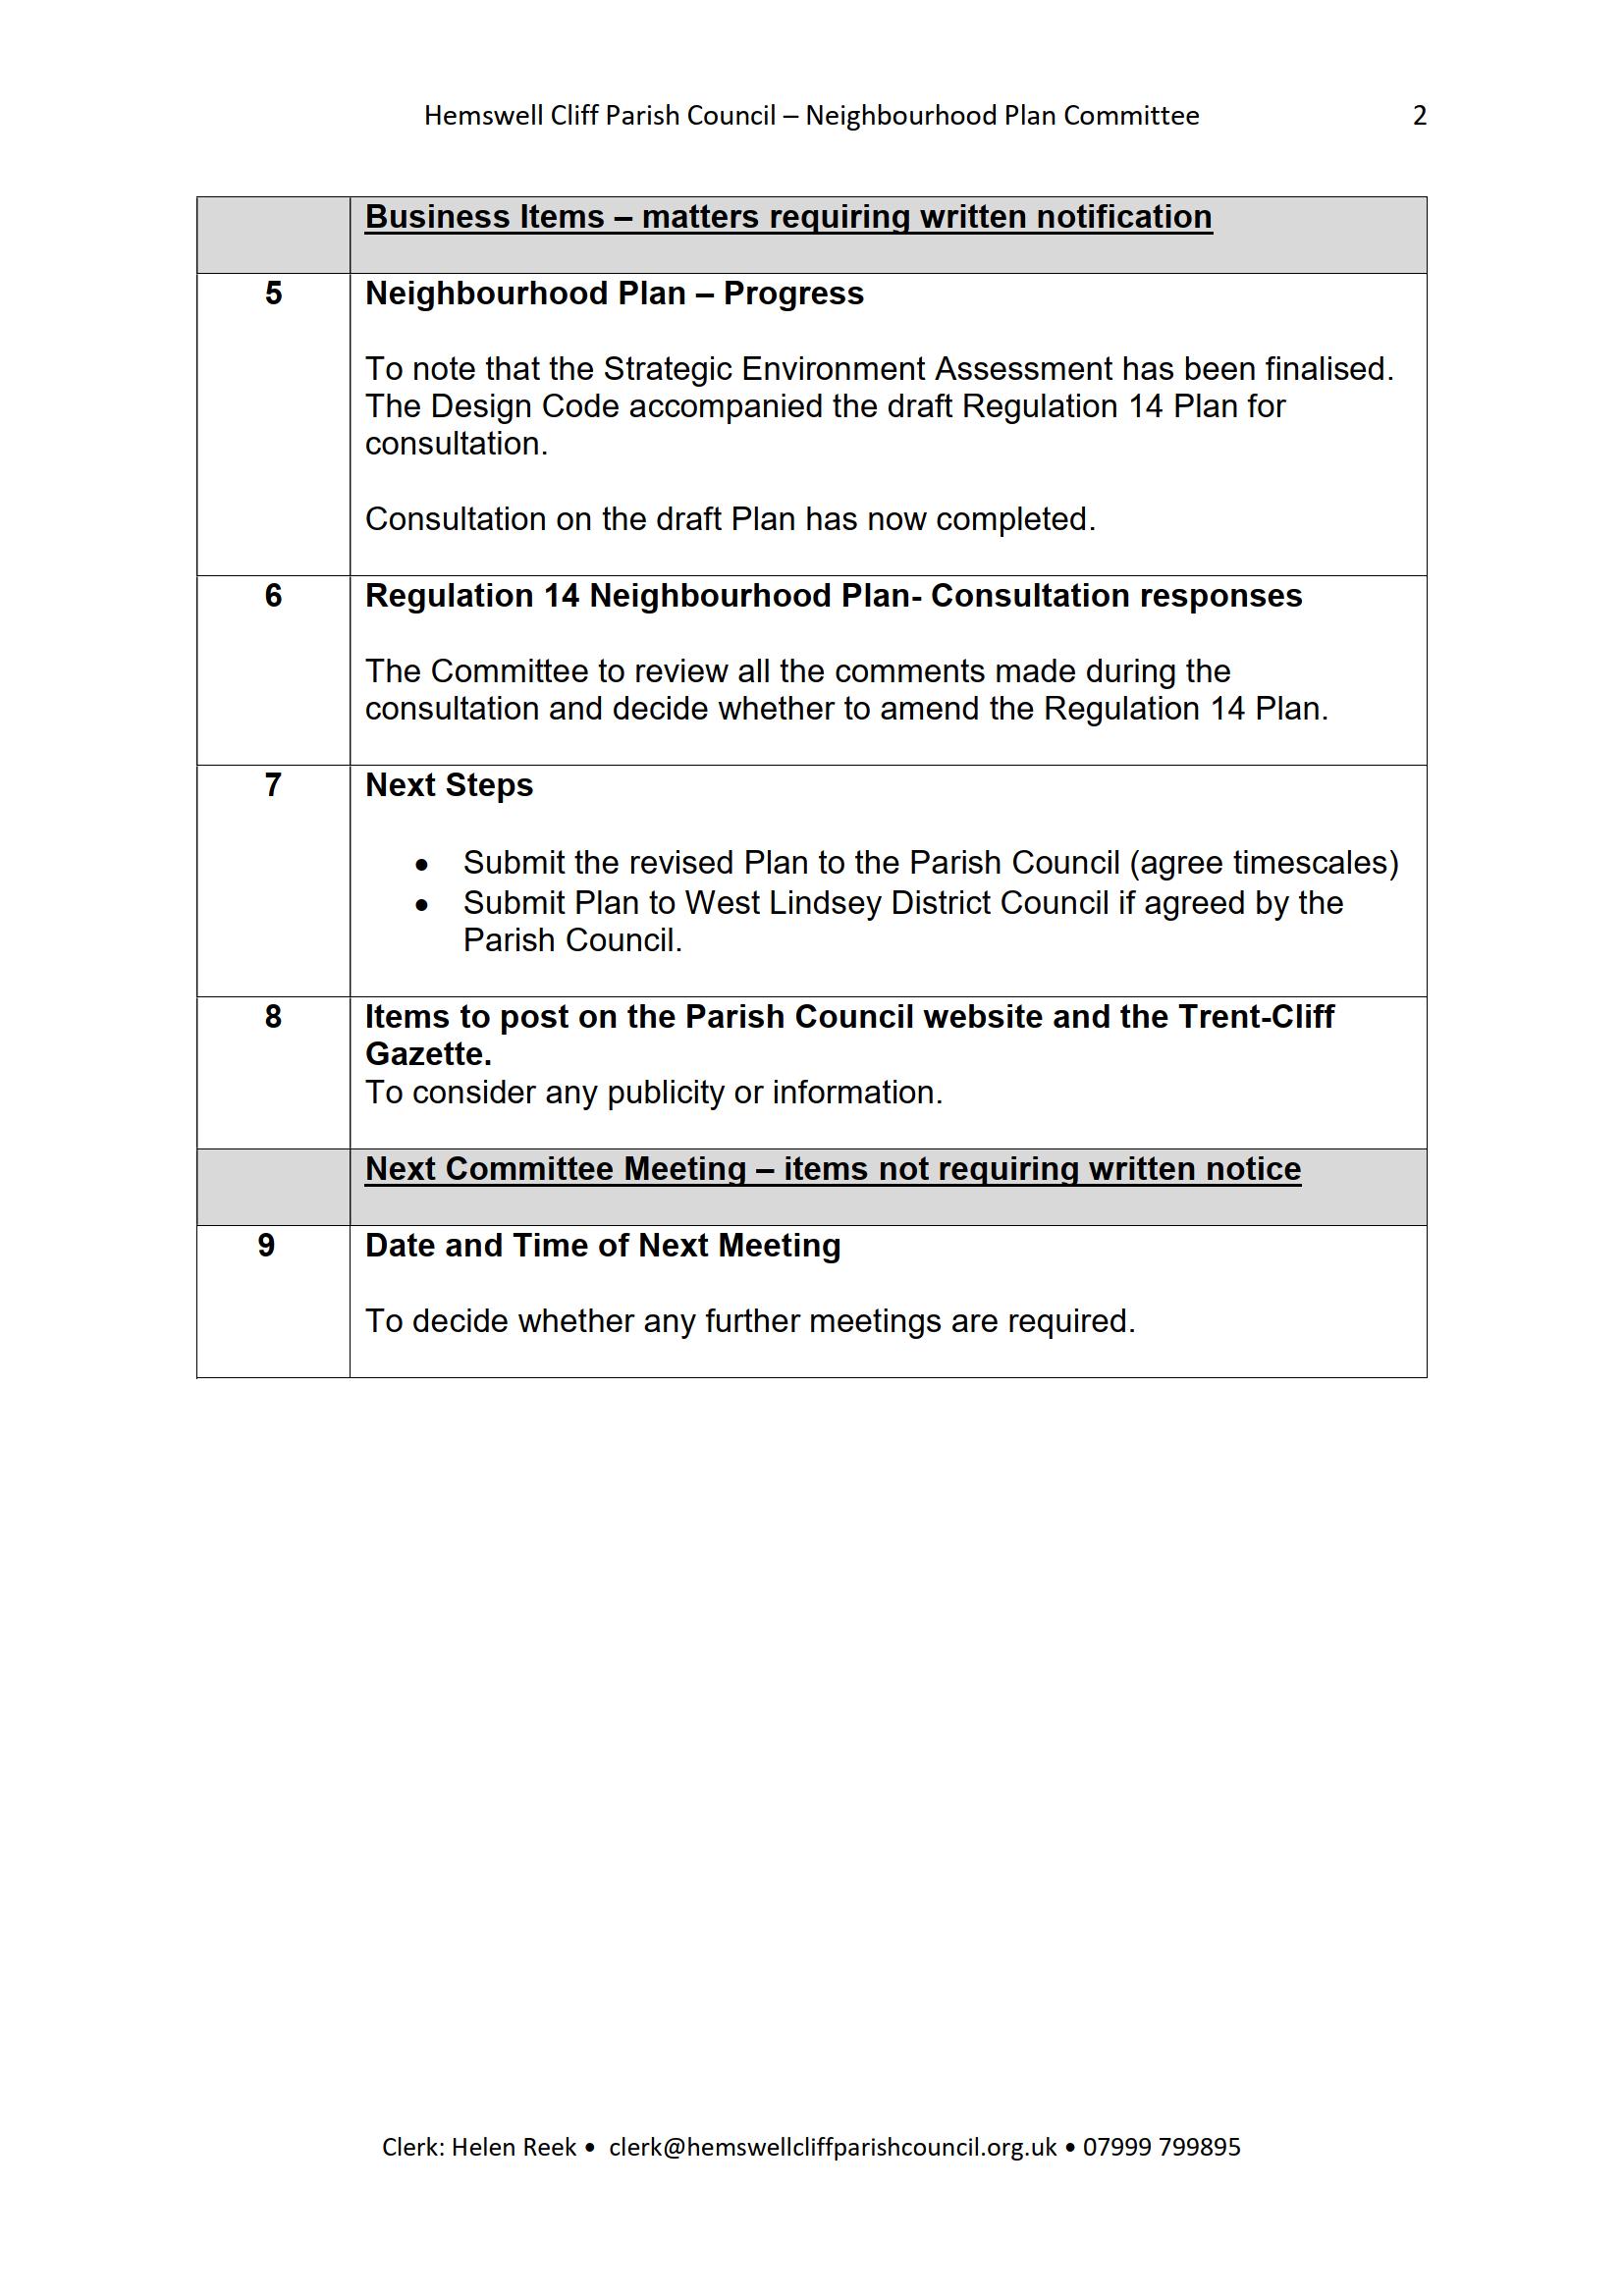 HCPC_NPC_Agenda_31.08.21_2.png